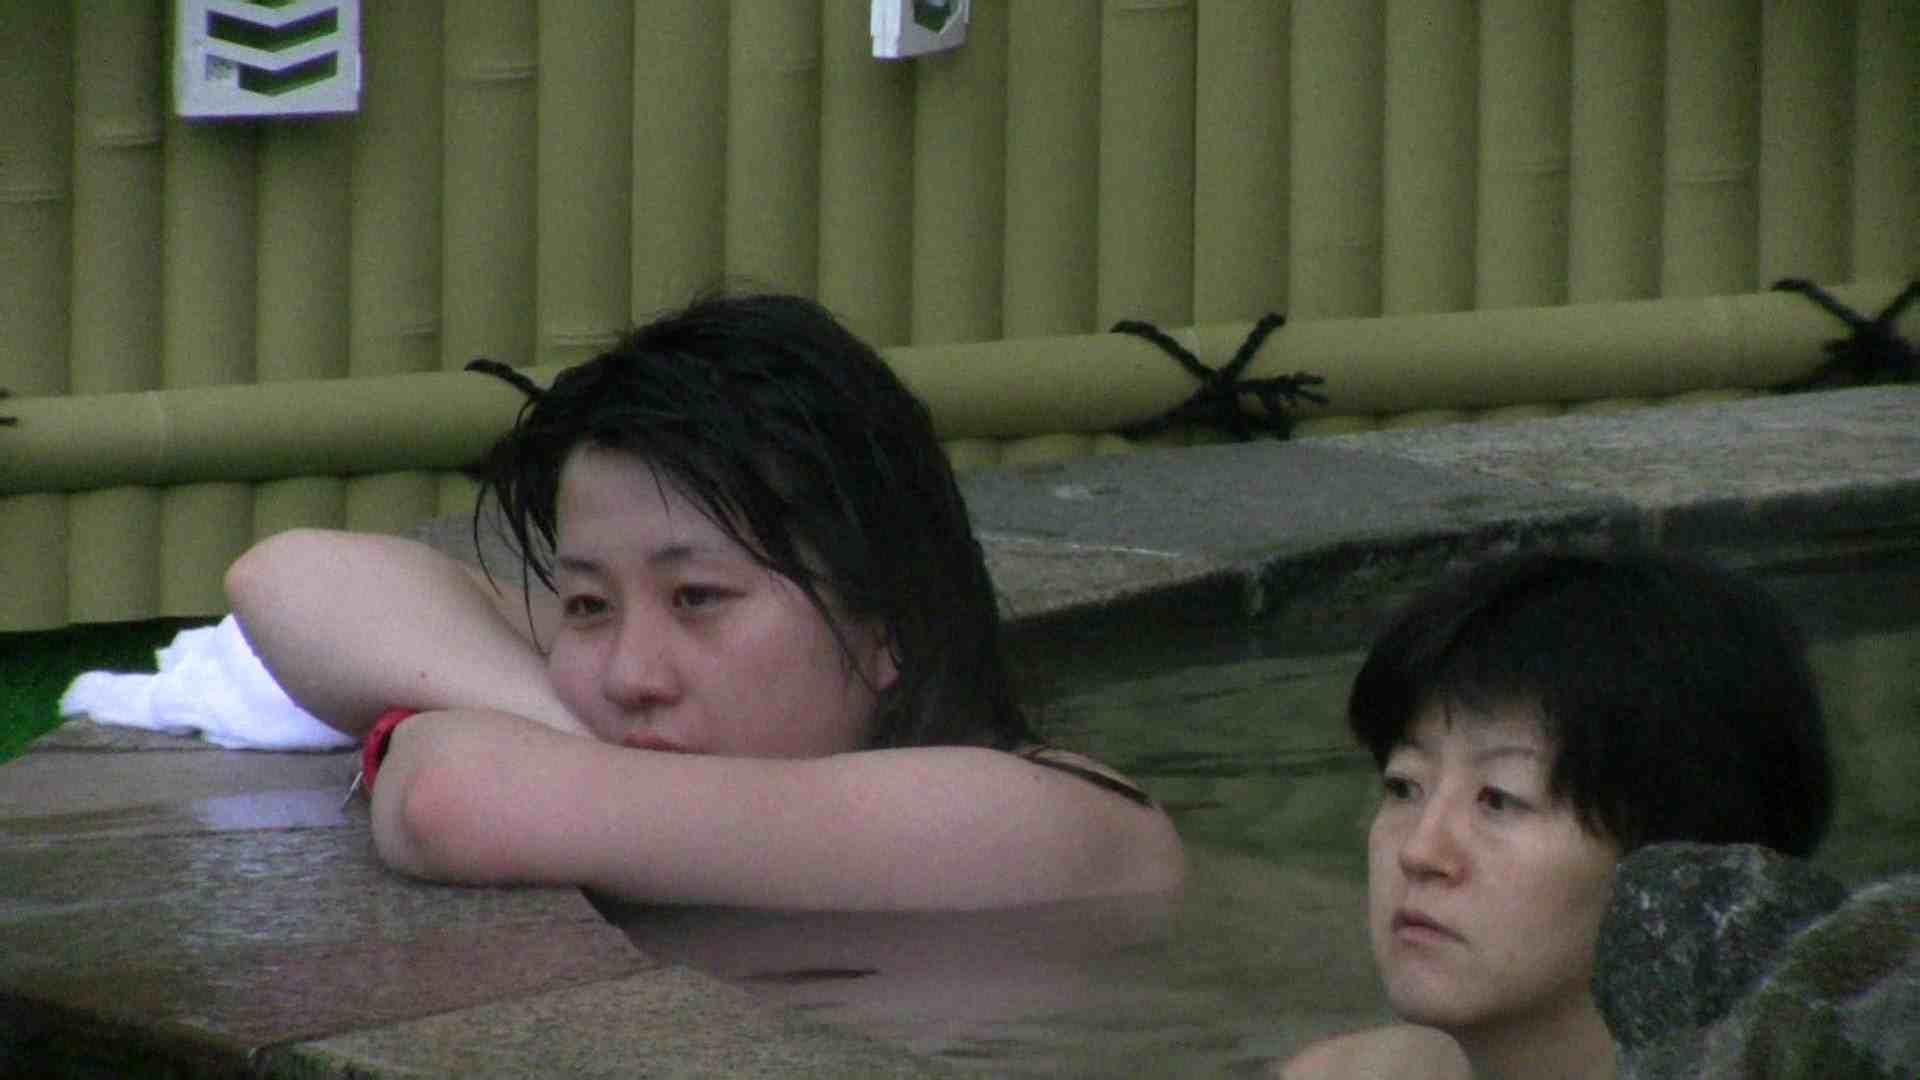 Aquaな露天風呂Vol.541 盗撮   OLセックス  48画像 37